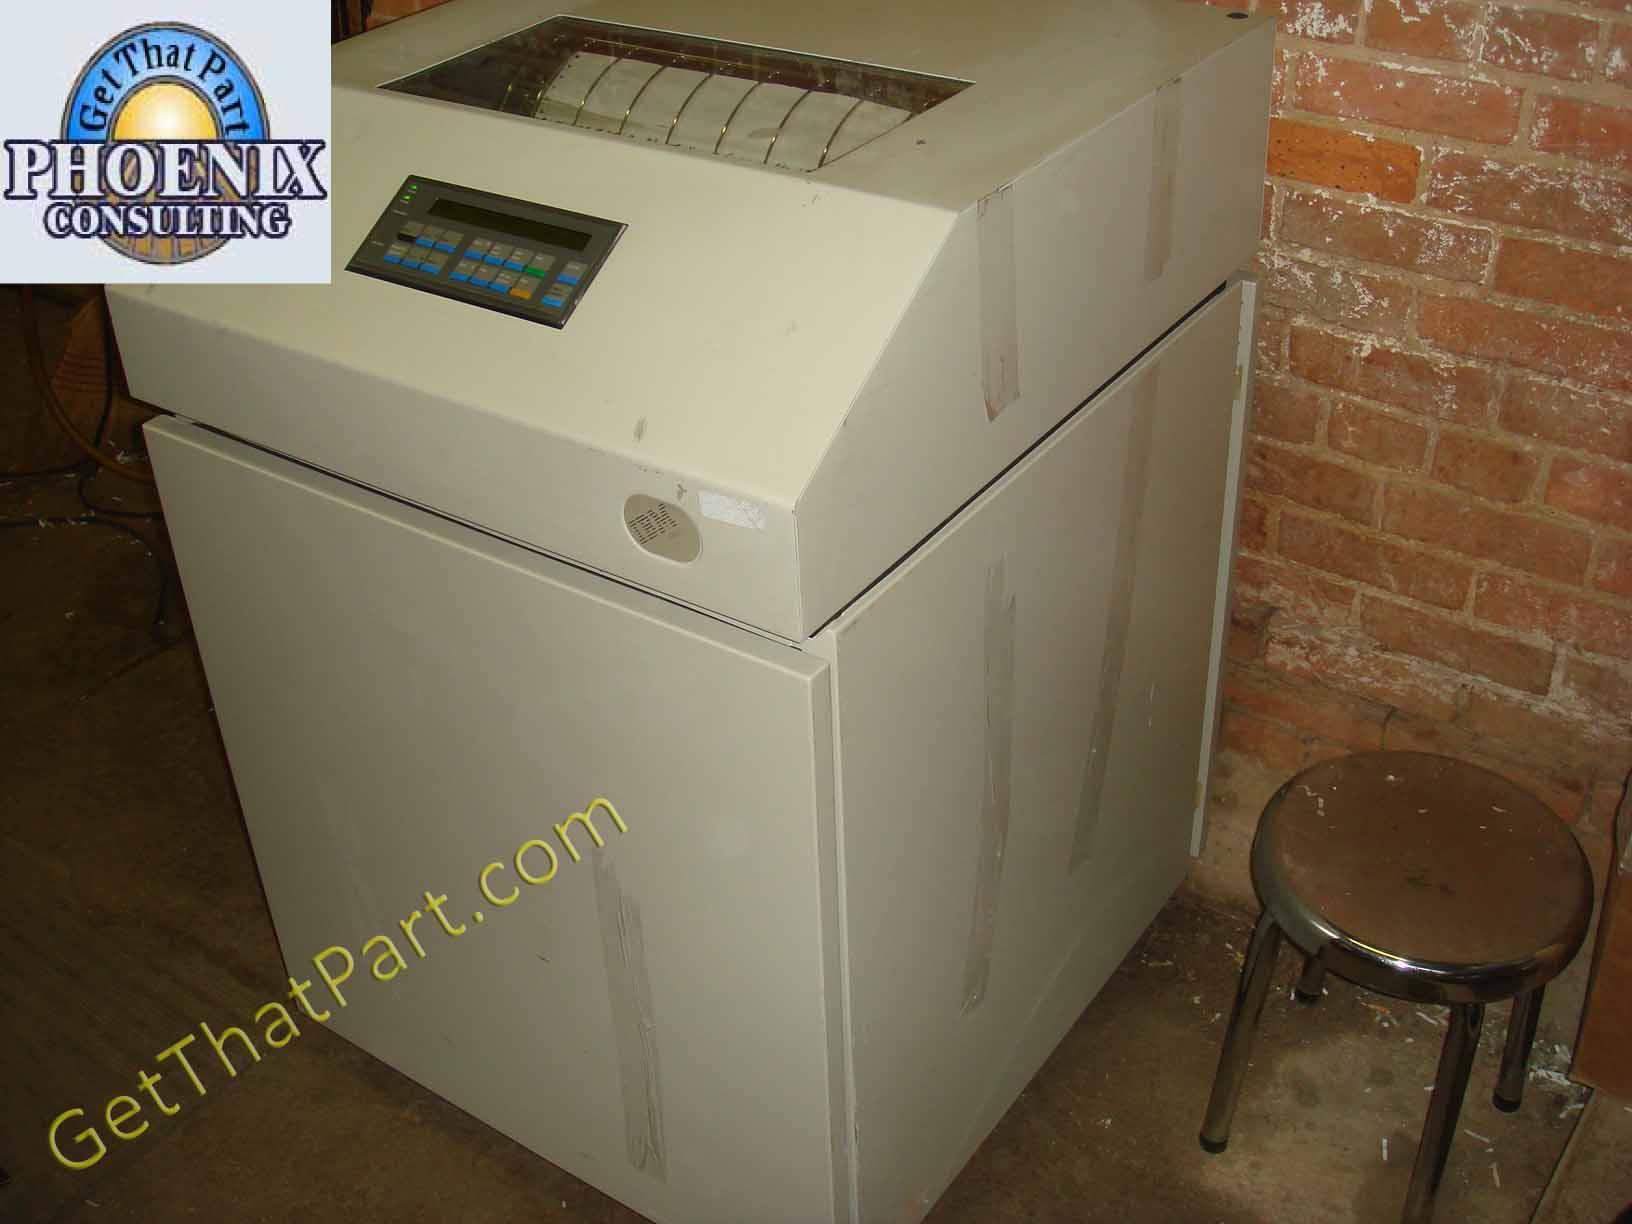 ibm 6400 i2s 6400i2s 2000 lpm line matrix network workgroup printer rh getthatpart com ibm 6500 printer manual ibm 6500 printer manual